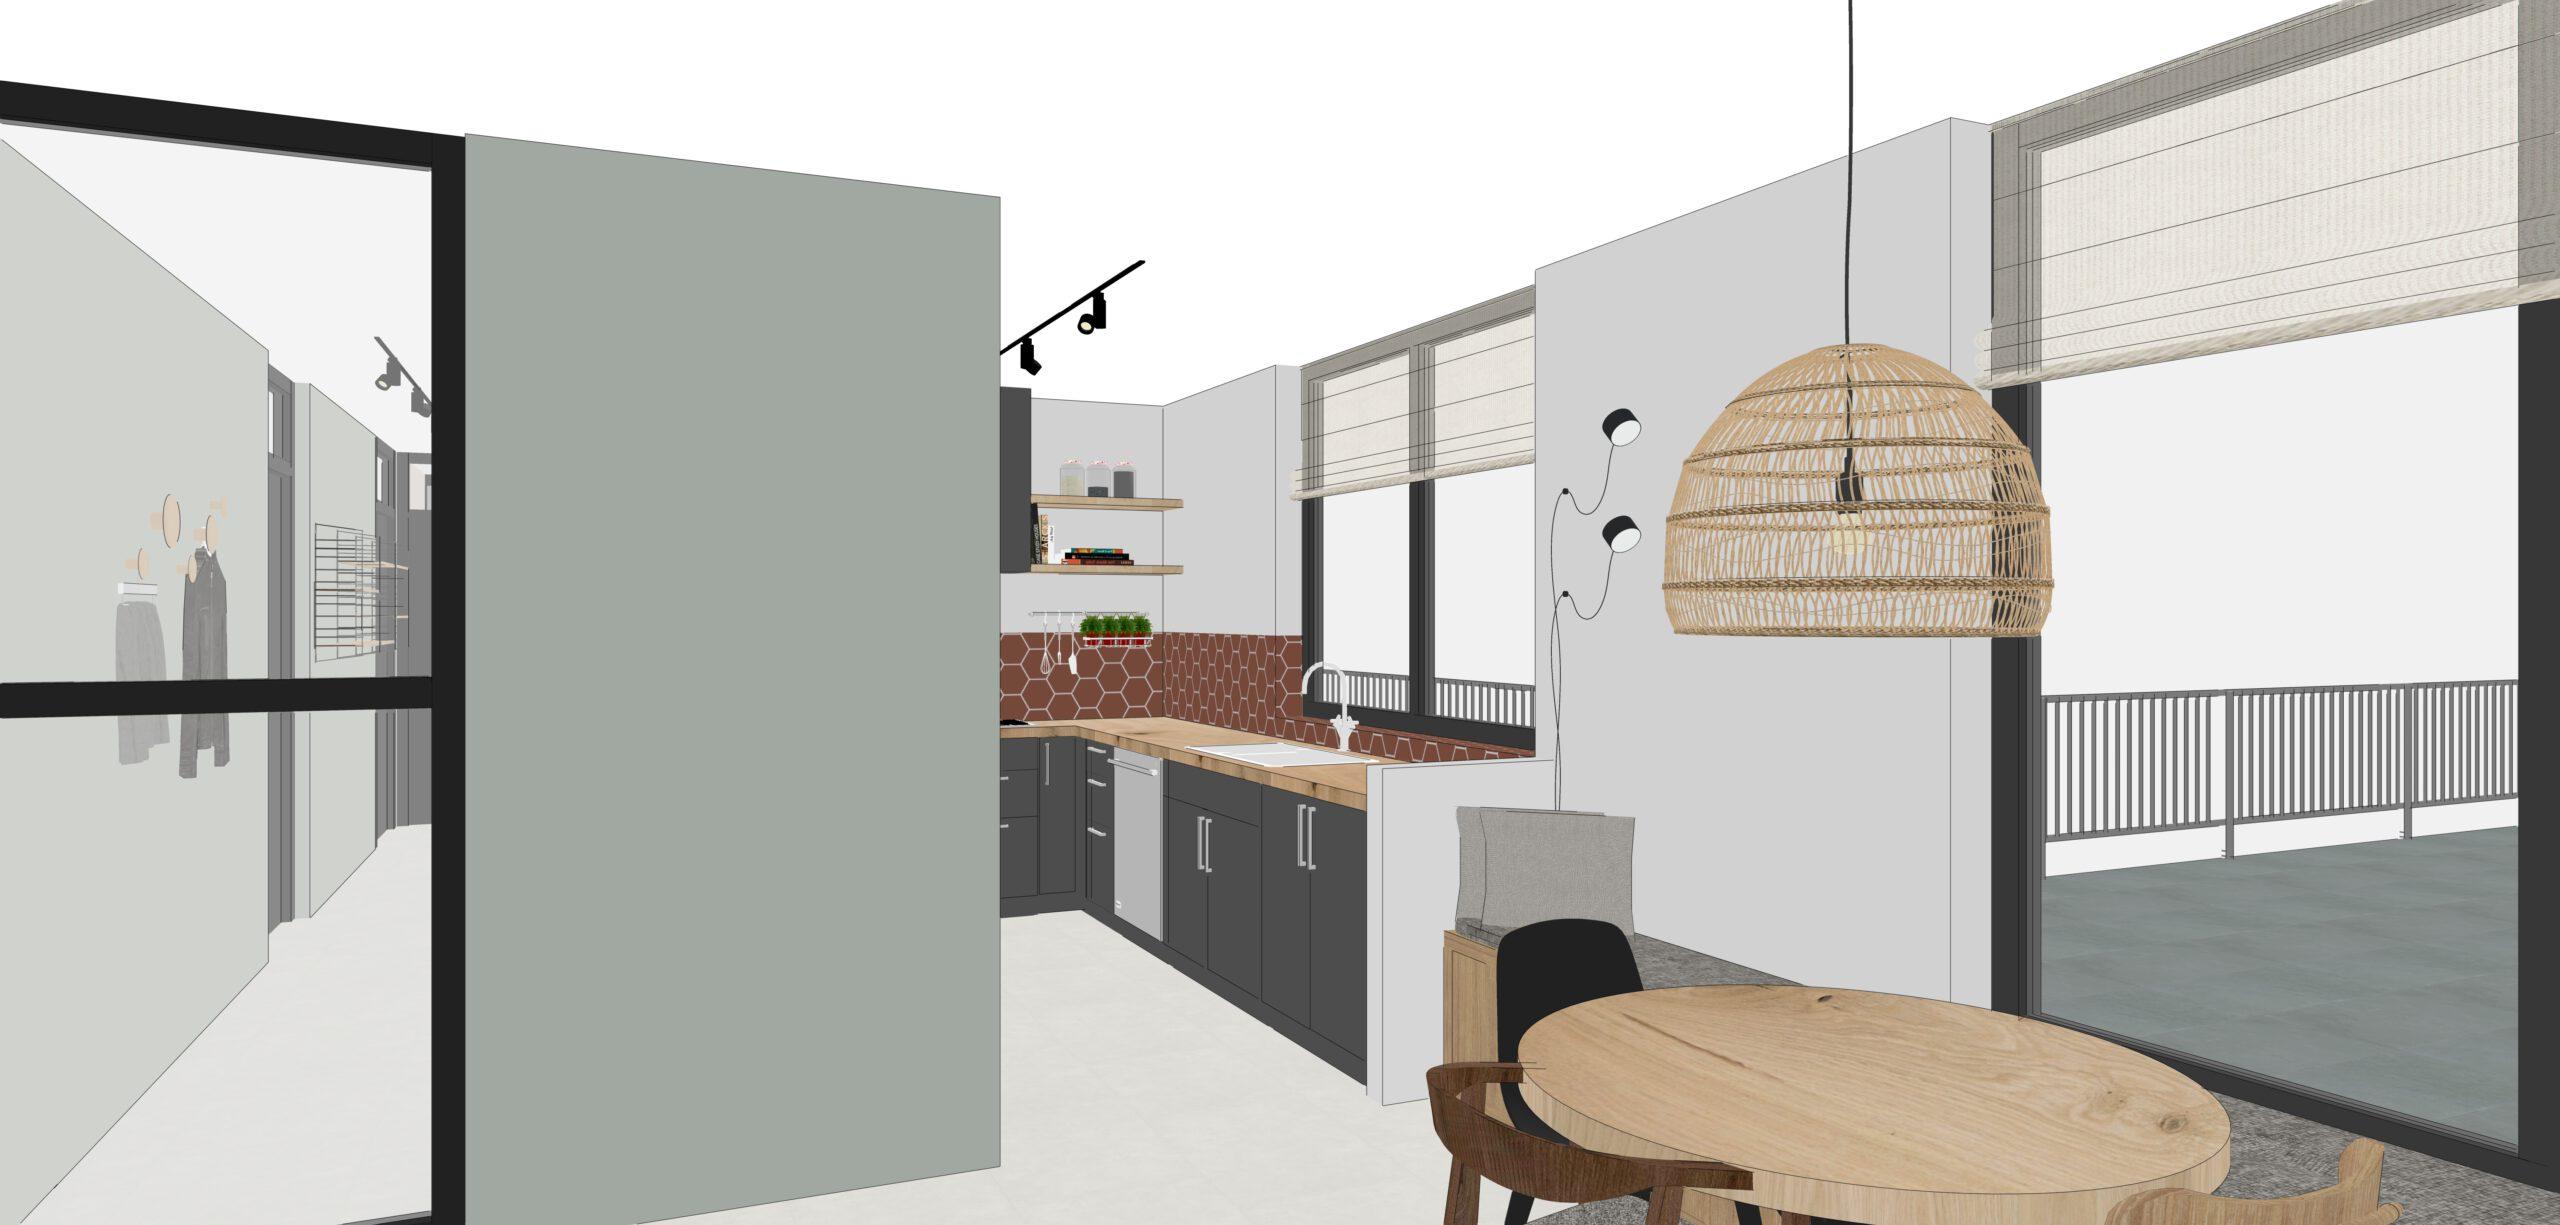 07. Keuken